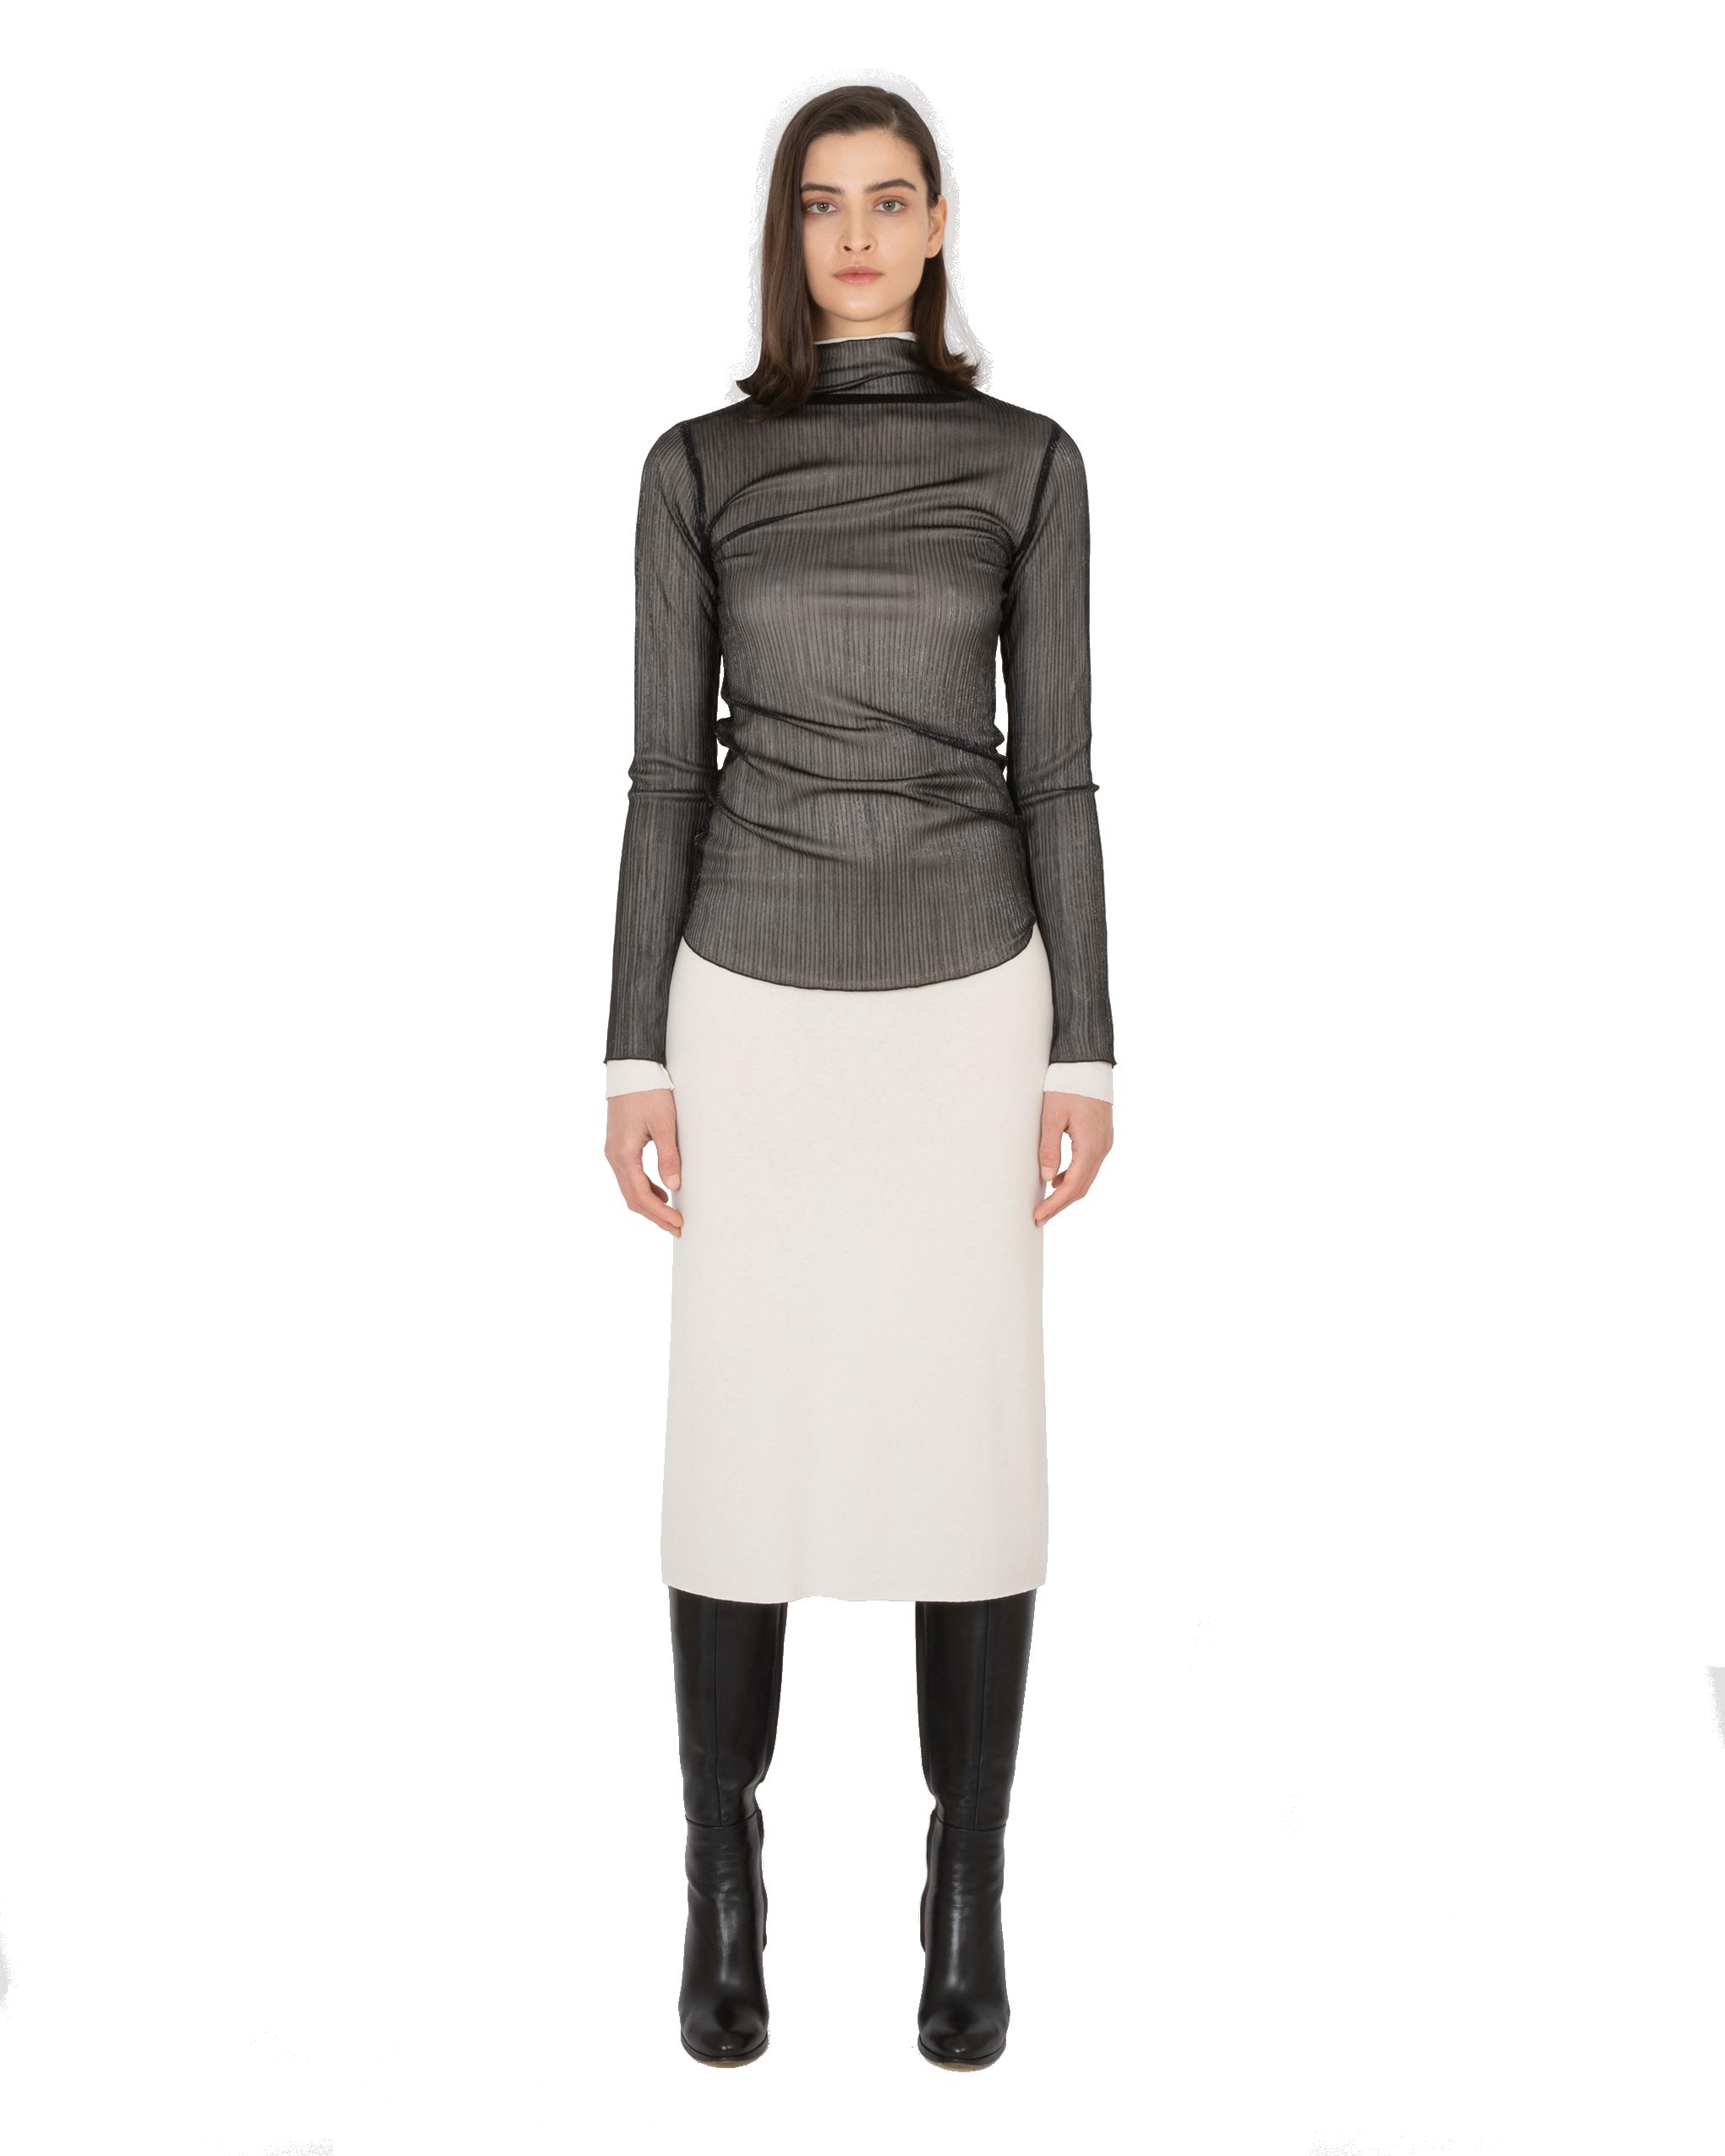 Model wearing EMIN + PAUL black shine lettuce edge blouse.